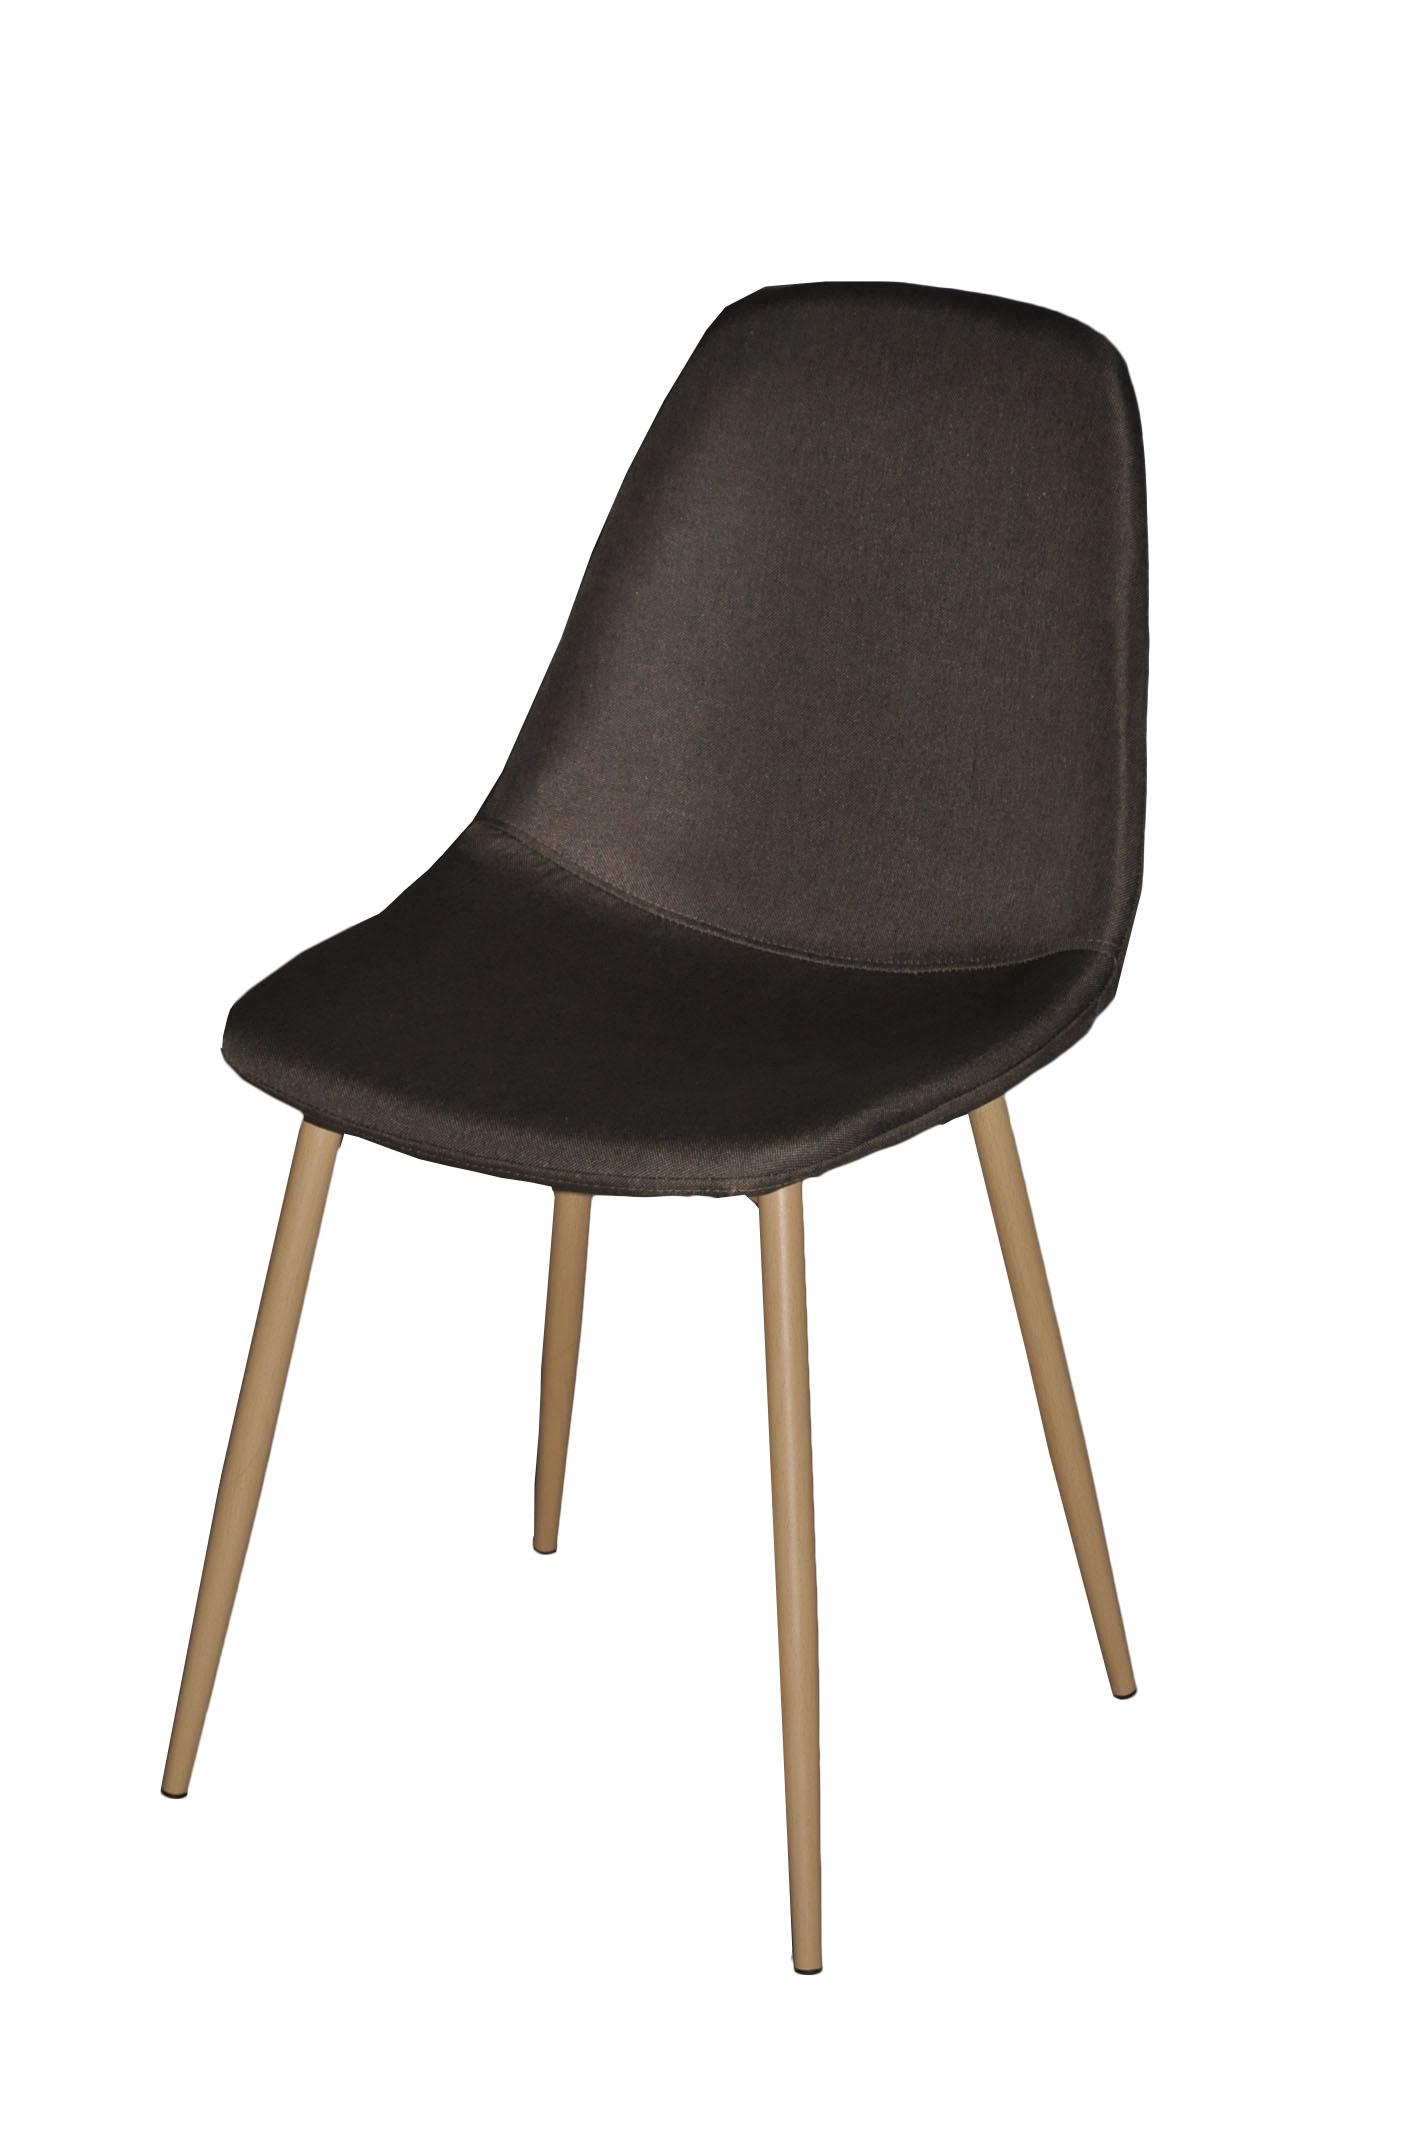 Chaise Design métal anthracite Style Scandinave Demeure